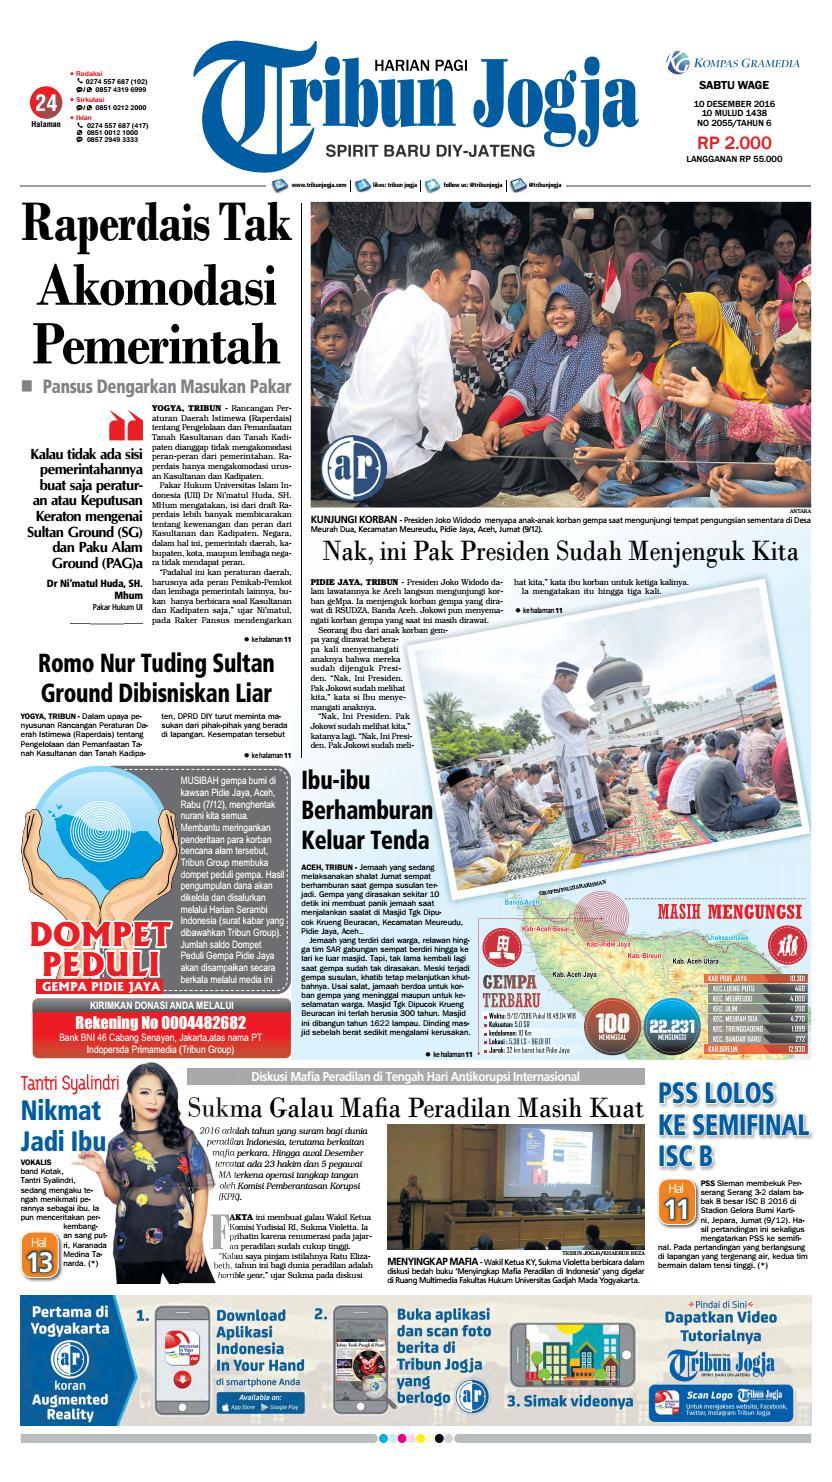 Tribunjogja 10 12 2016 By Tribun Jogja Issuu Produk Ukm Bumn Bale Sehat Teh Rosella Merah 3 Box